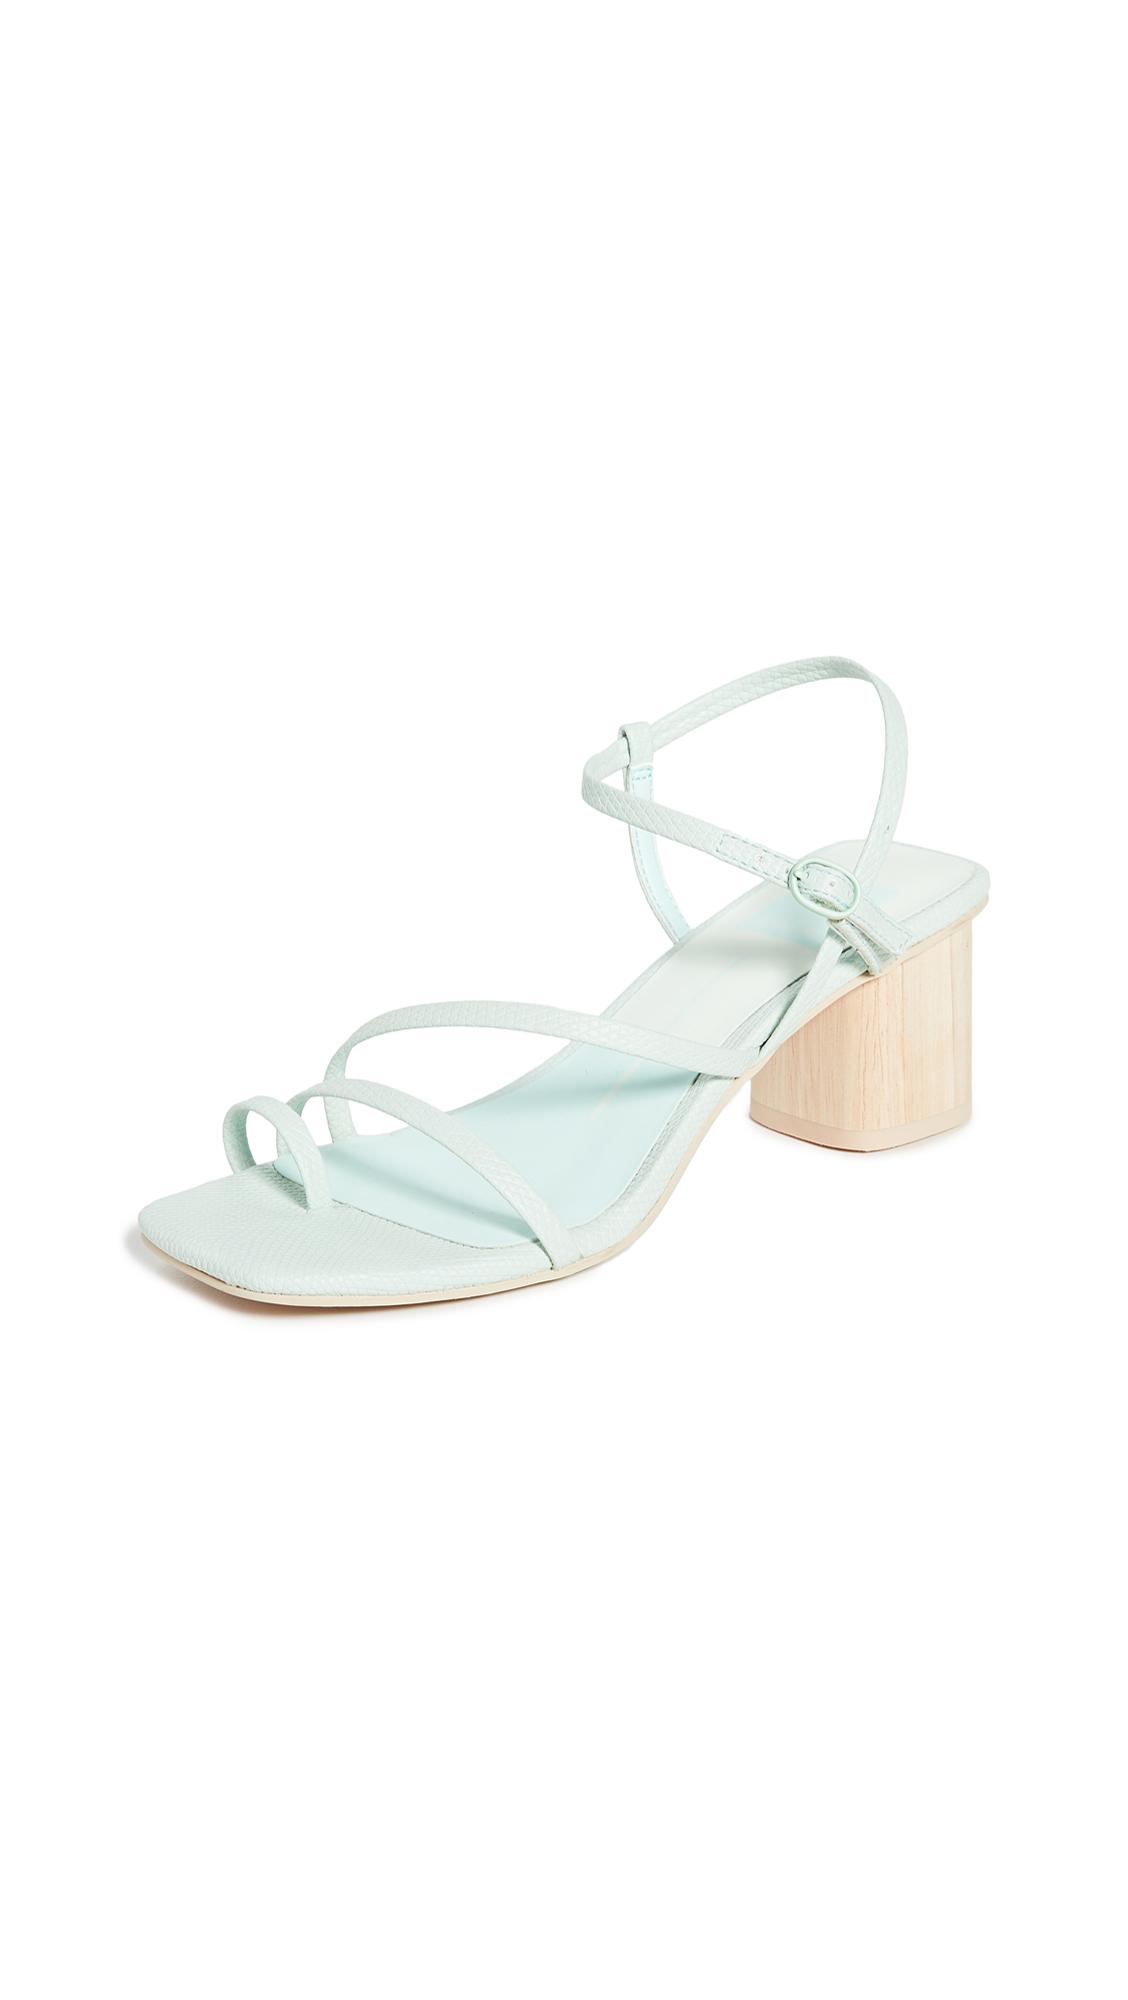 Buy Dolce Vita Zyda Sandals online, shop Dolce Vita